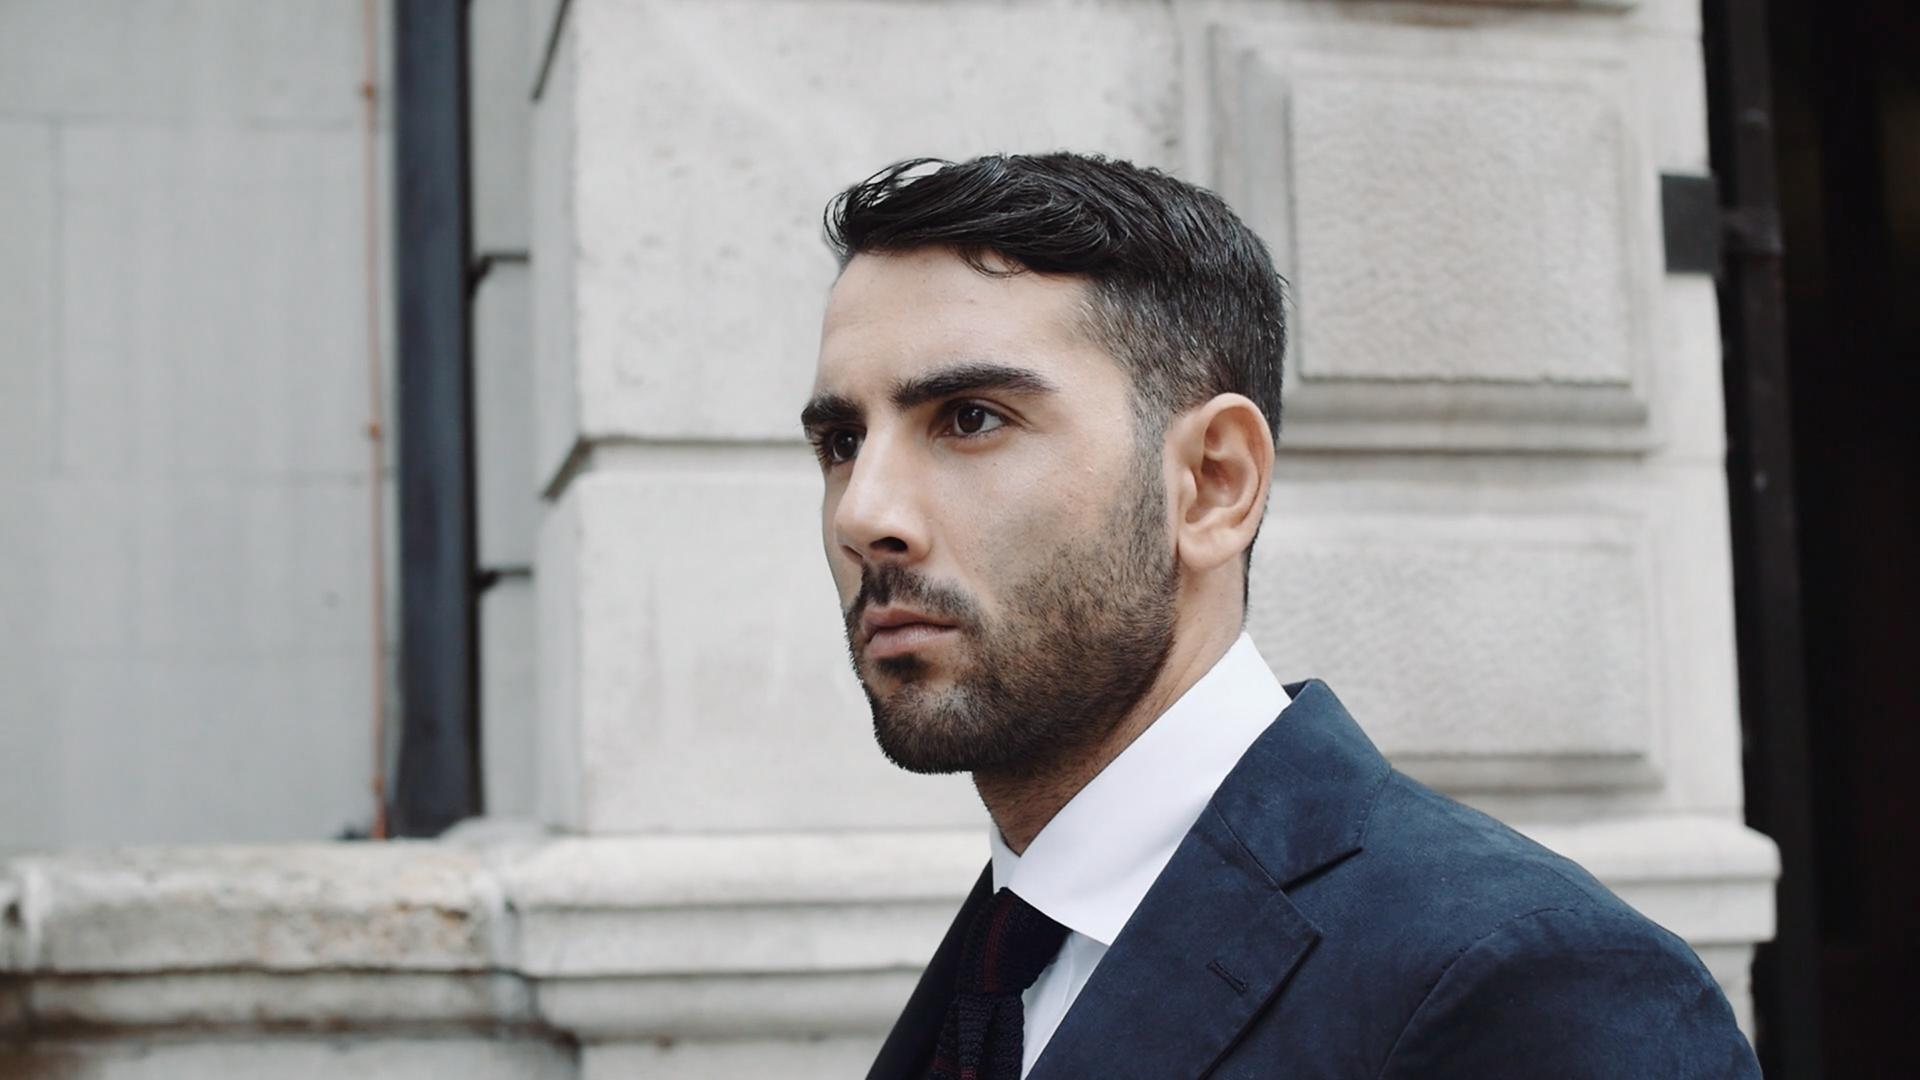 Model | Giuseppe Faro